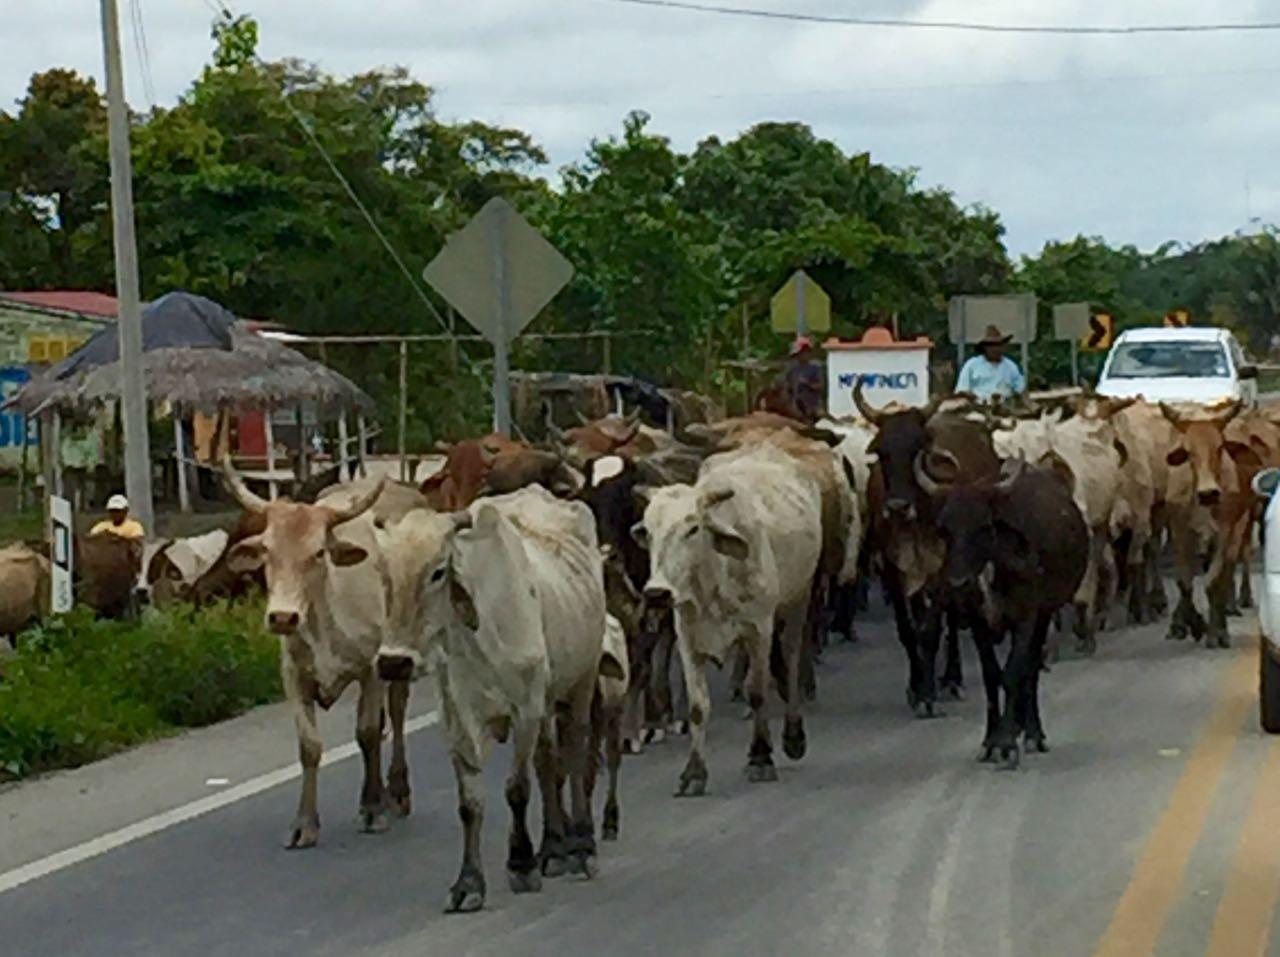 Cows on the Road, Ecuador.jpg